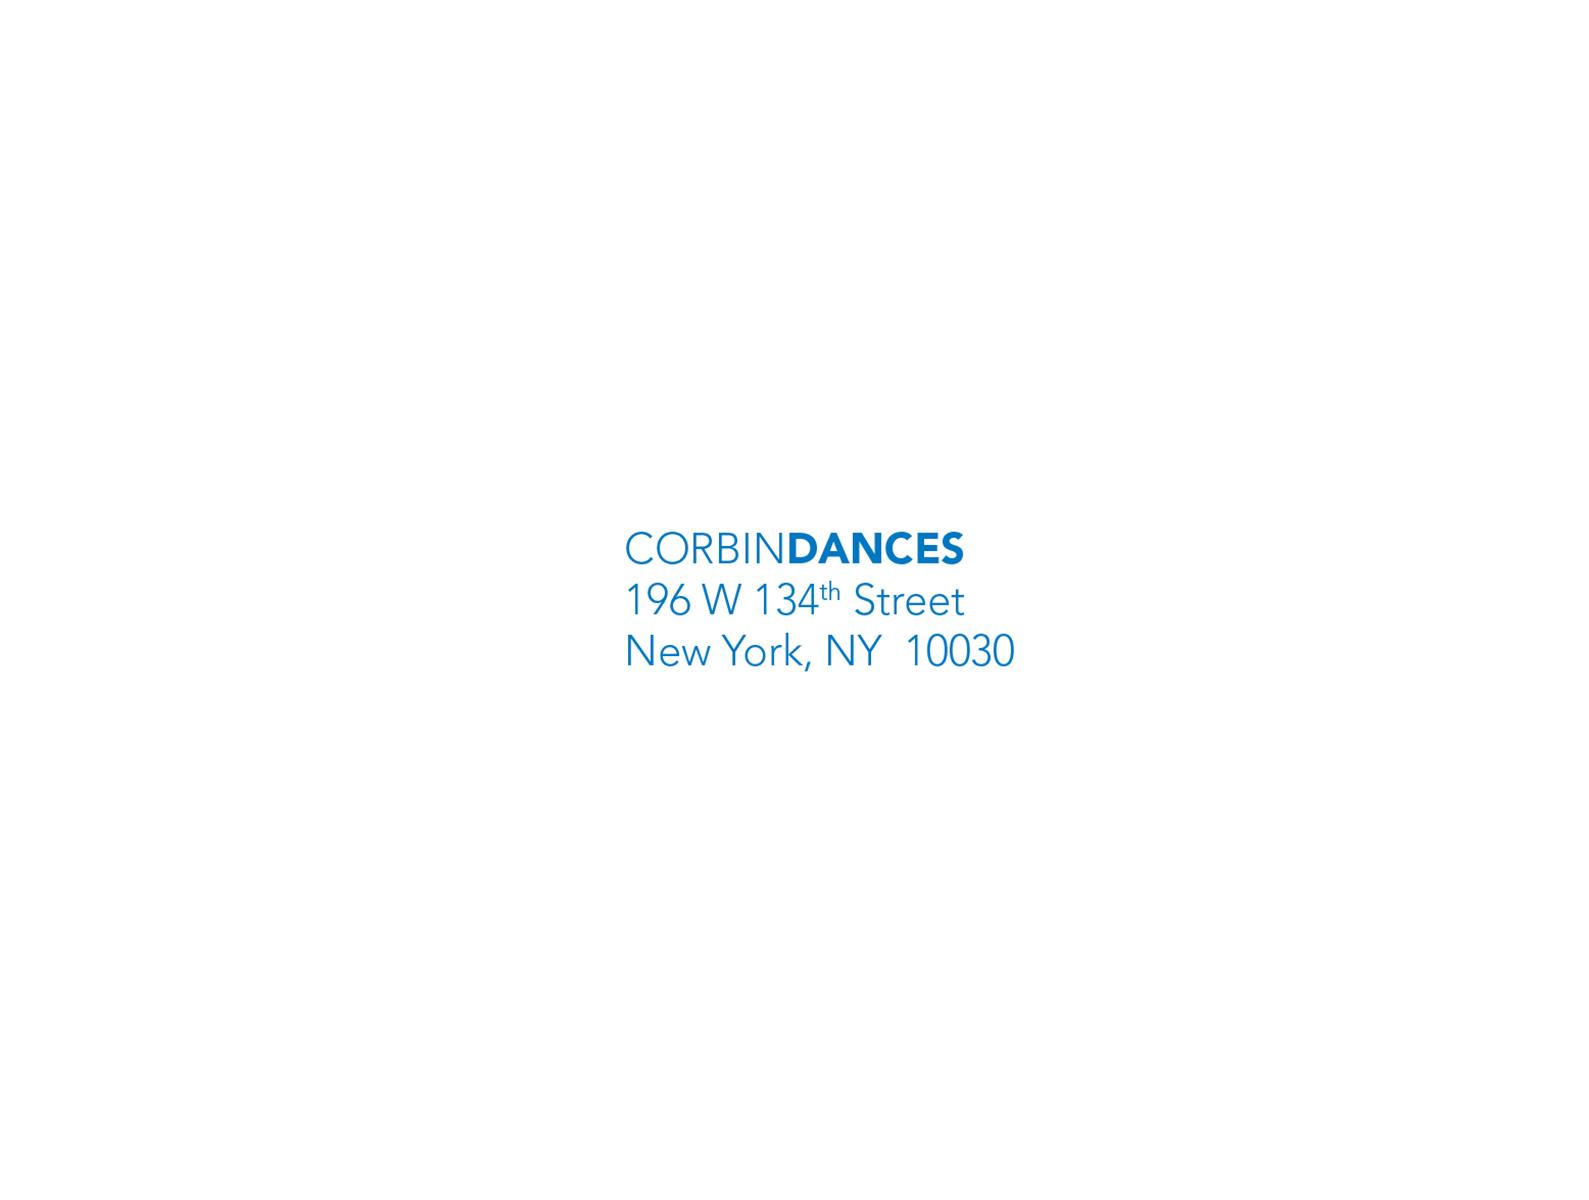 CorbinDances 2011 Invitation - RSVP Envelope